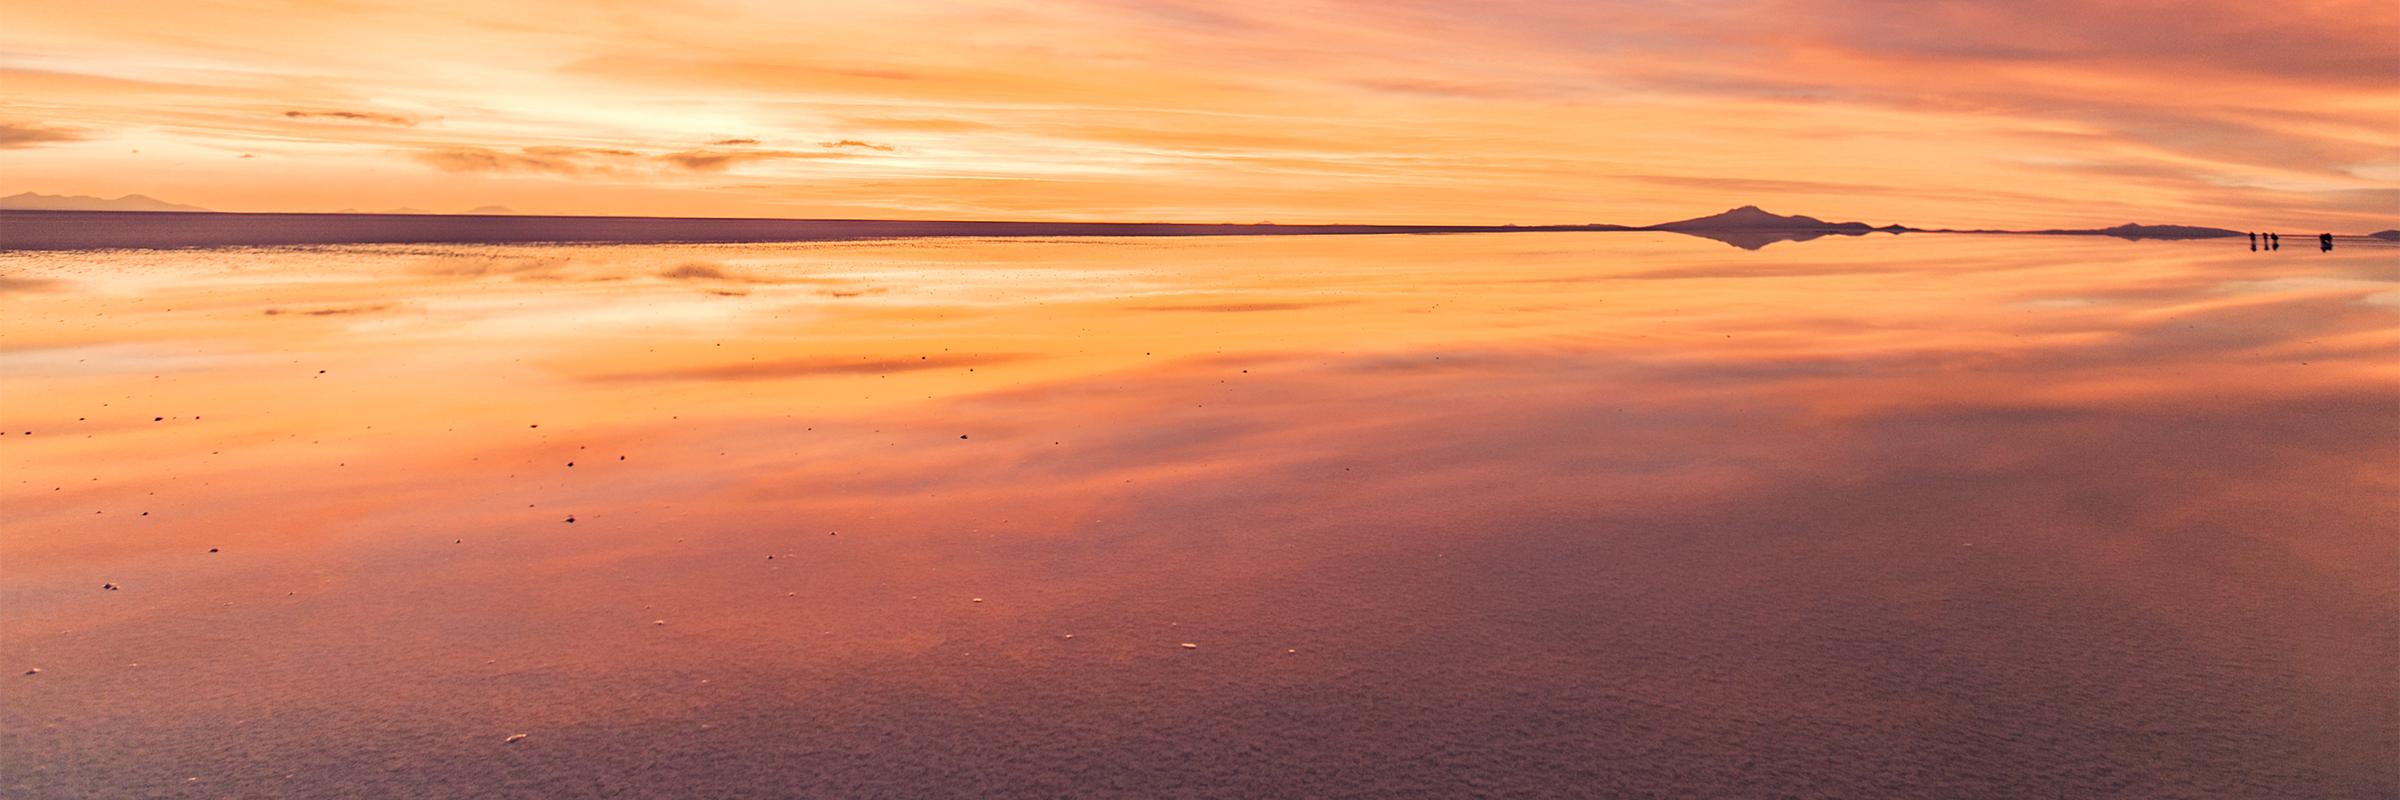 Photraveller Yori Uyuni sunset